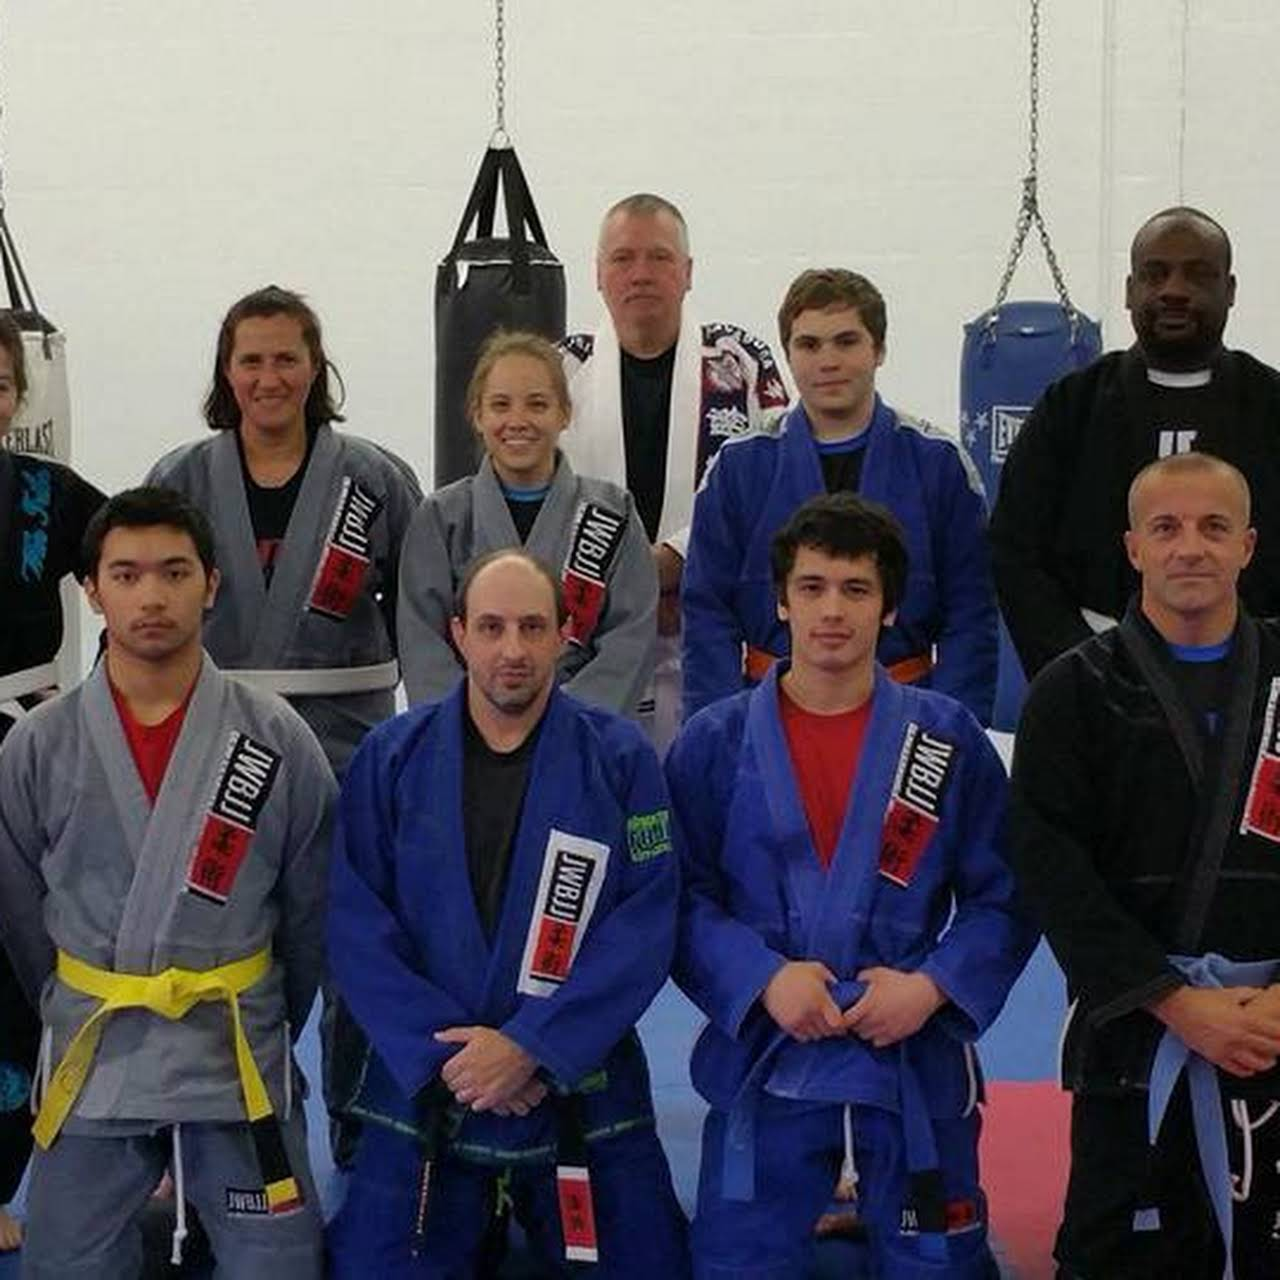 JW Brazilian Jiu-Jitsu - Portage County's Premier Brazilian